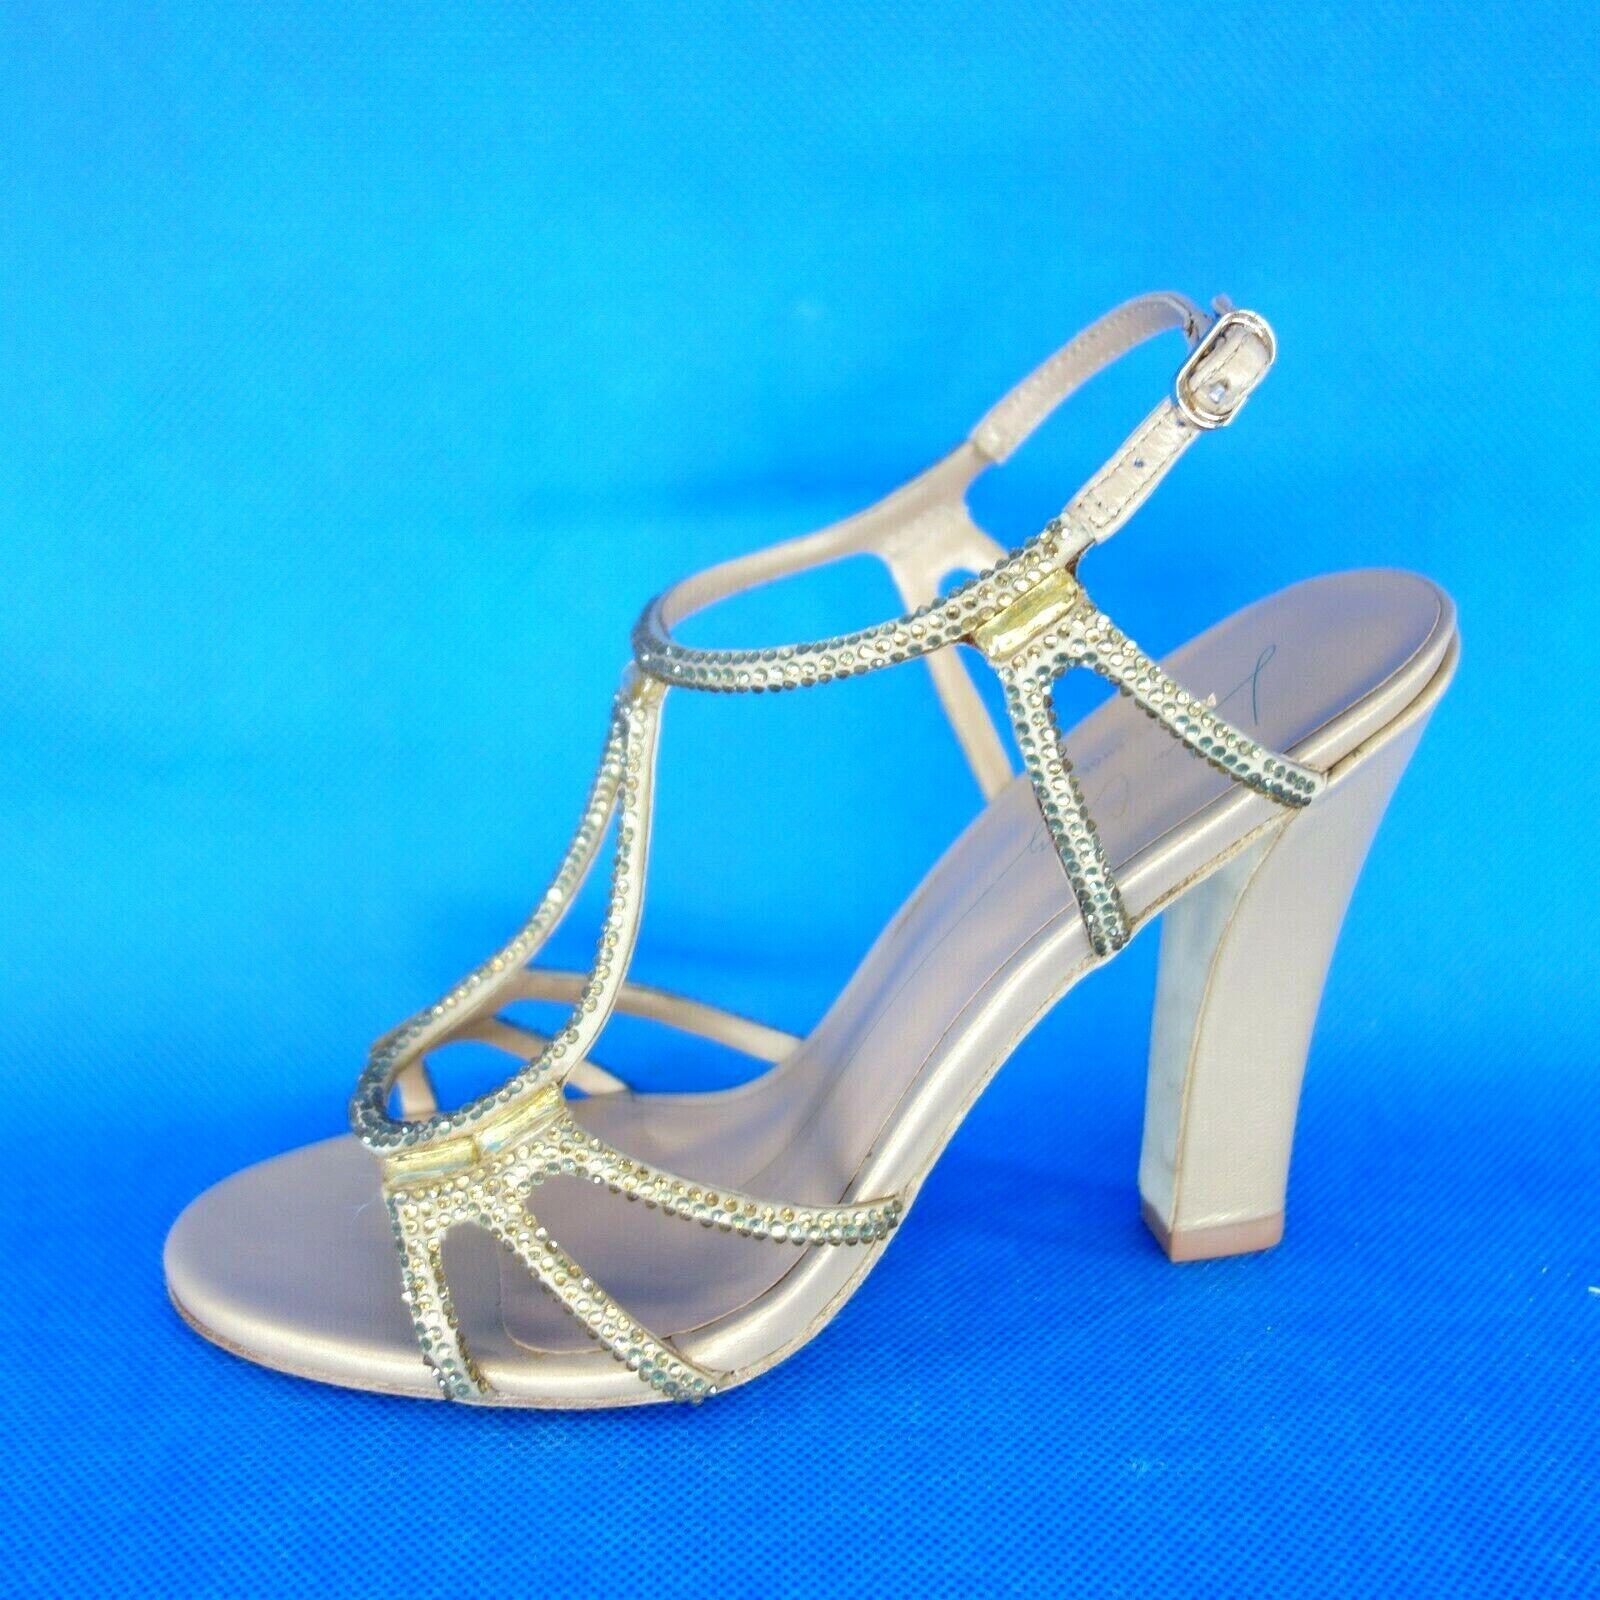 LOLA CRUZ Damen Pumps Sandaletten Gr 37 38 Leder Straßsteine Schuhe NP 195 NEU